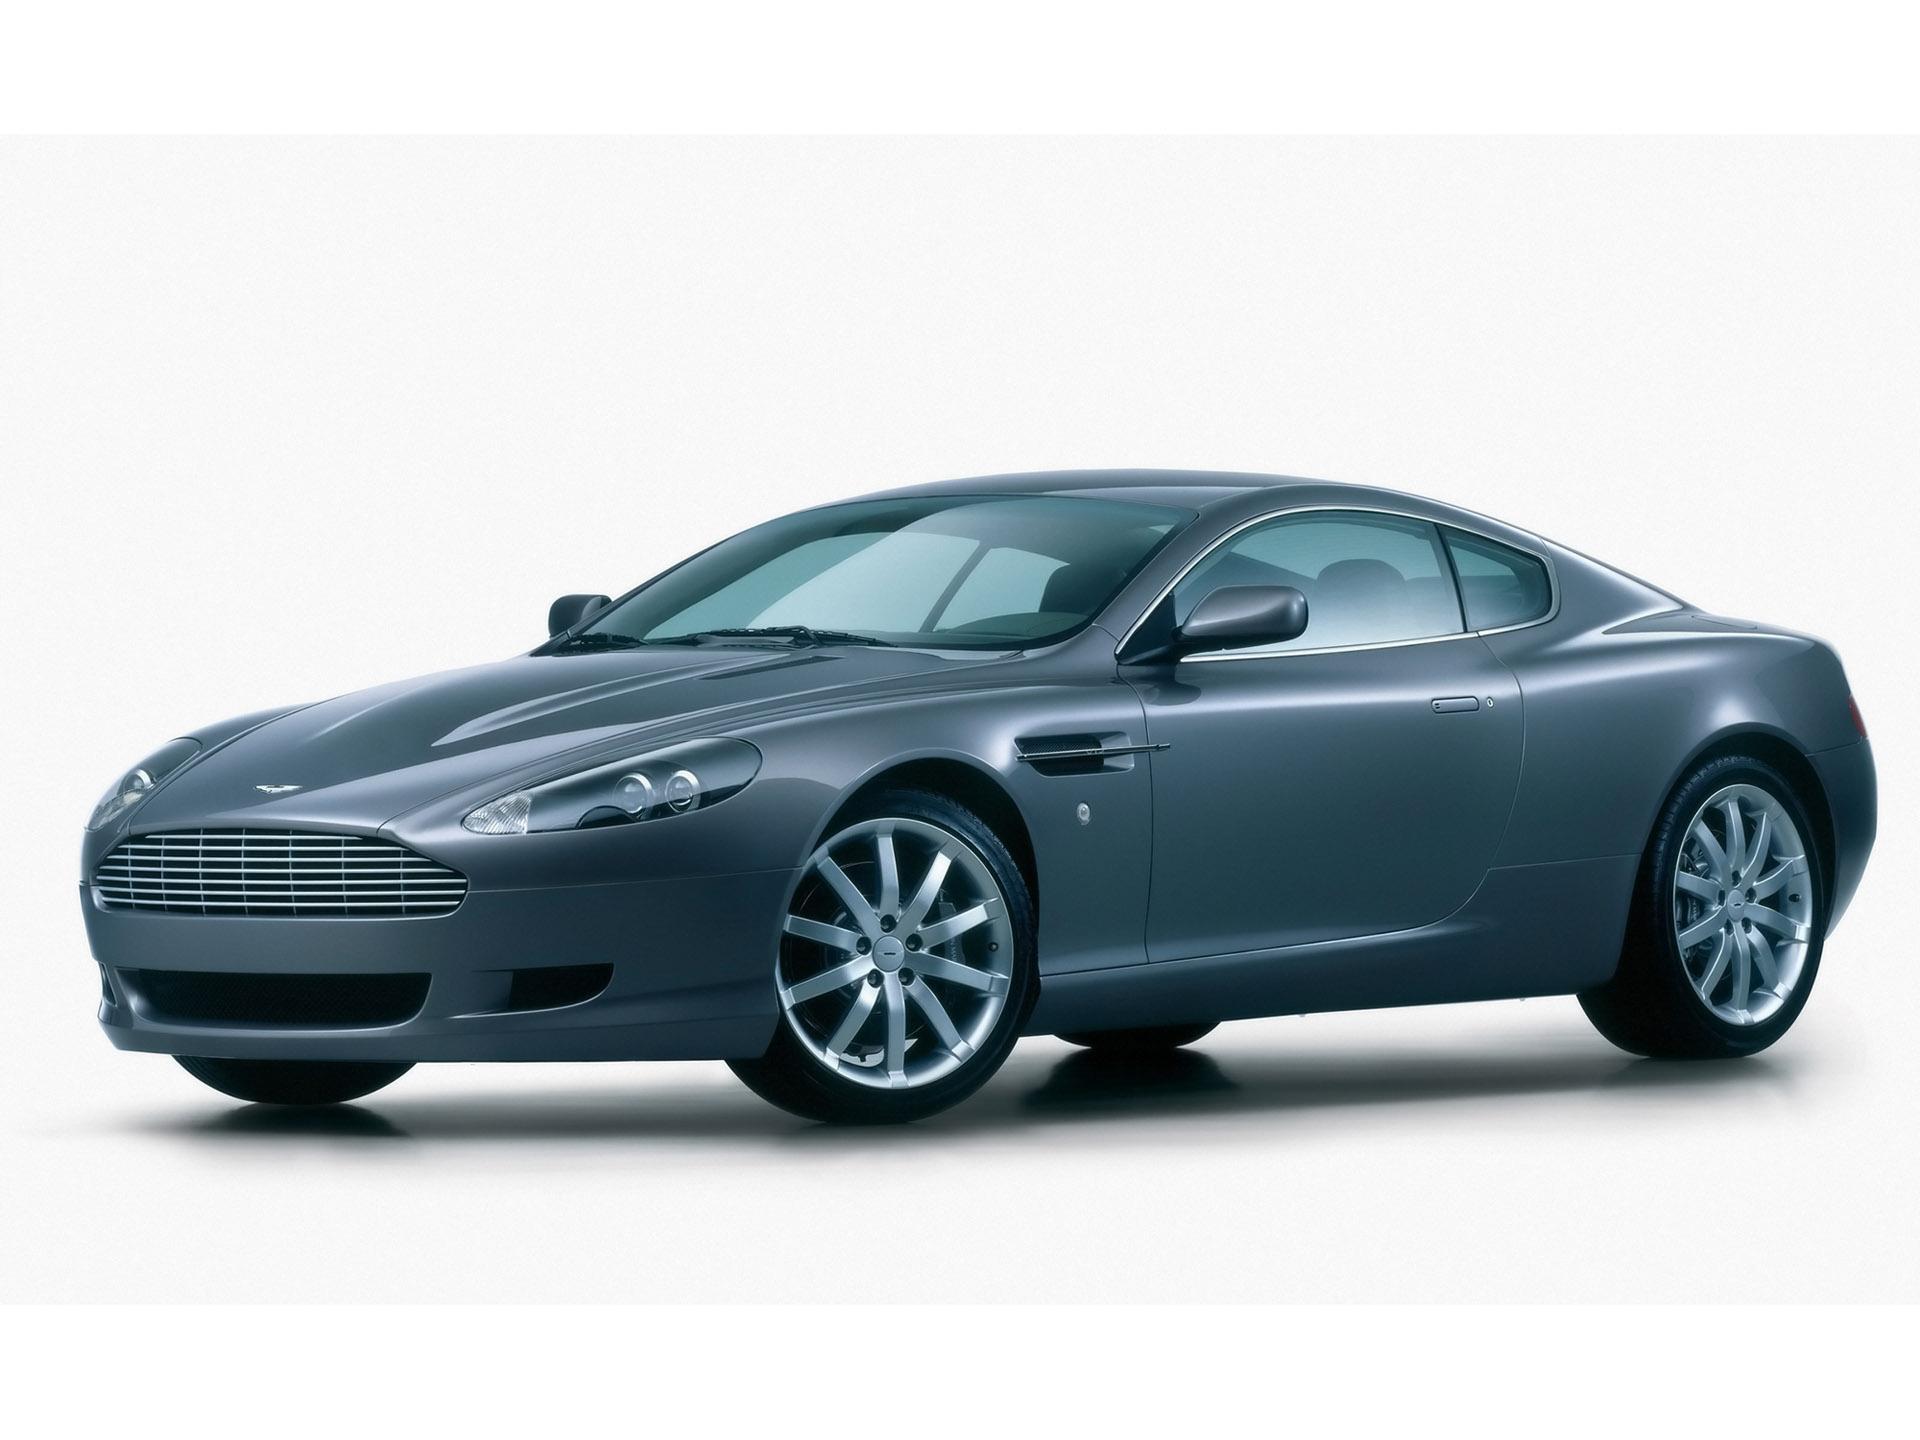 Aston Martin DB9 Side Angle Studio Wallpaper For Desktop